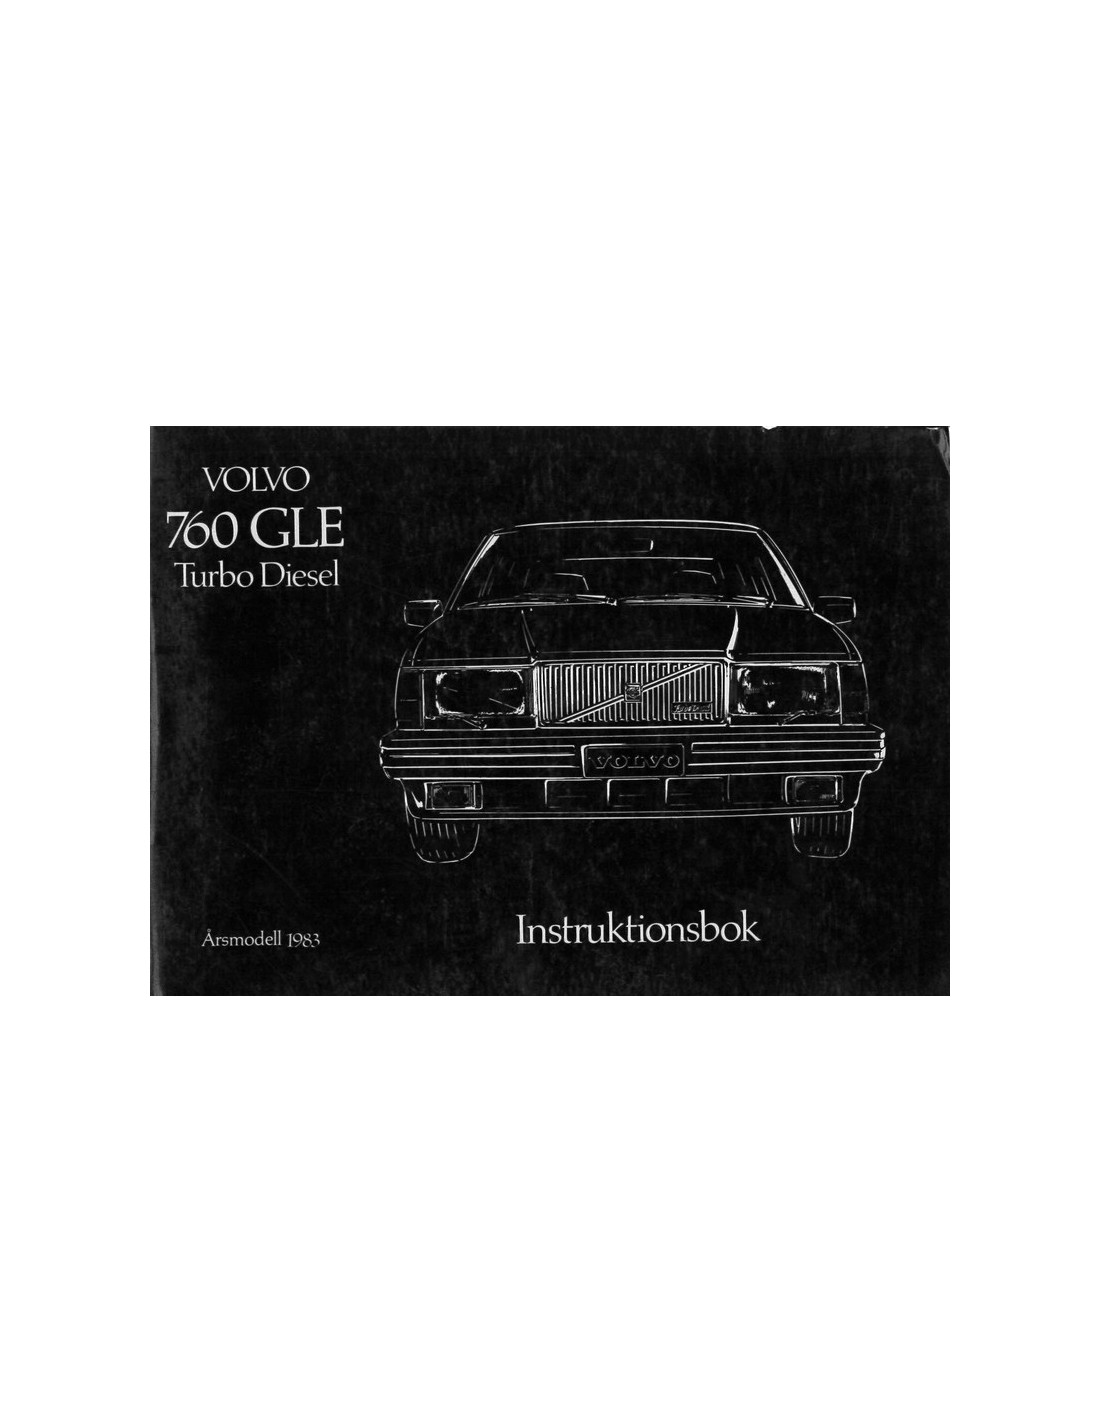 1983 volvo 760 gle diesel owner s manual swedish rh autolit eu 760 Volvo Rear End Volvo 760 Truck